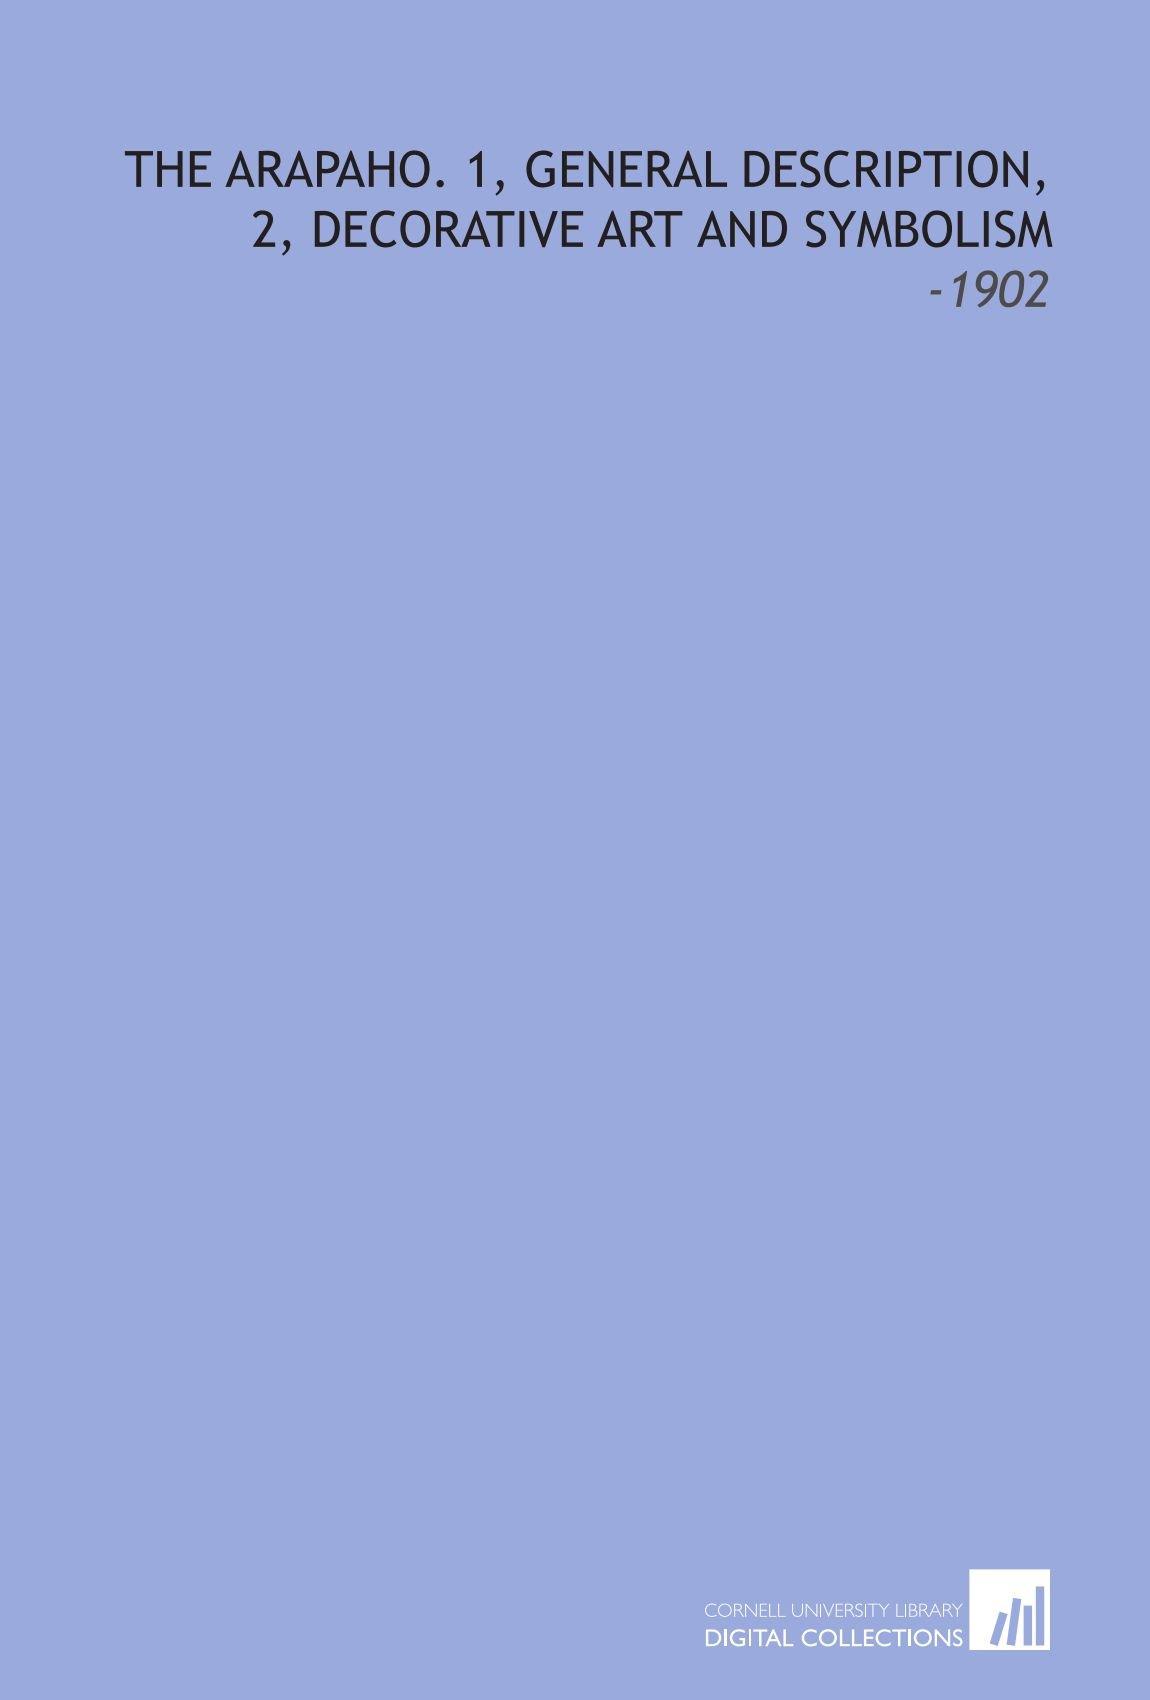 Download The Arapaho. 1, General Description, 2, Decorative Art and Symbolism: -1902 PDF ePub book